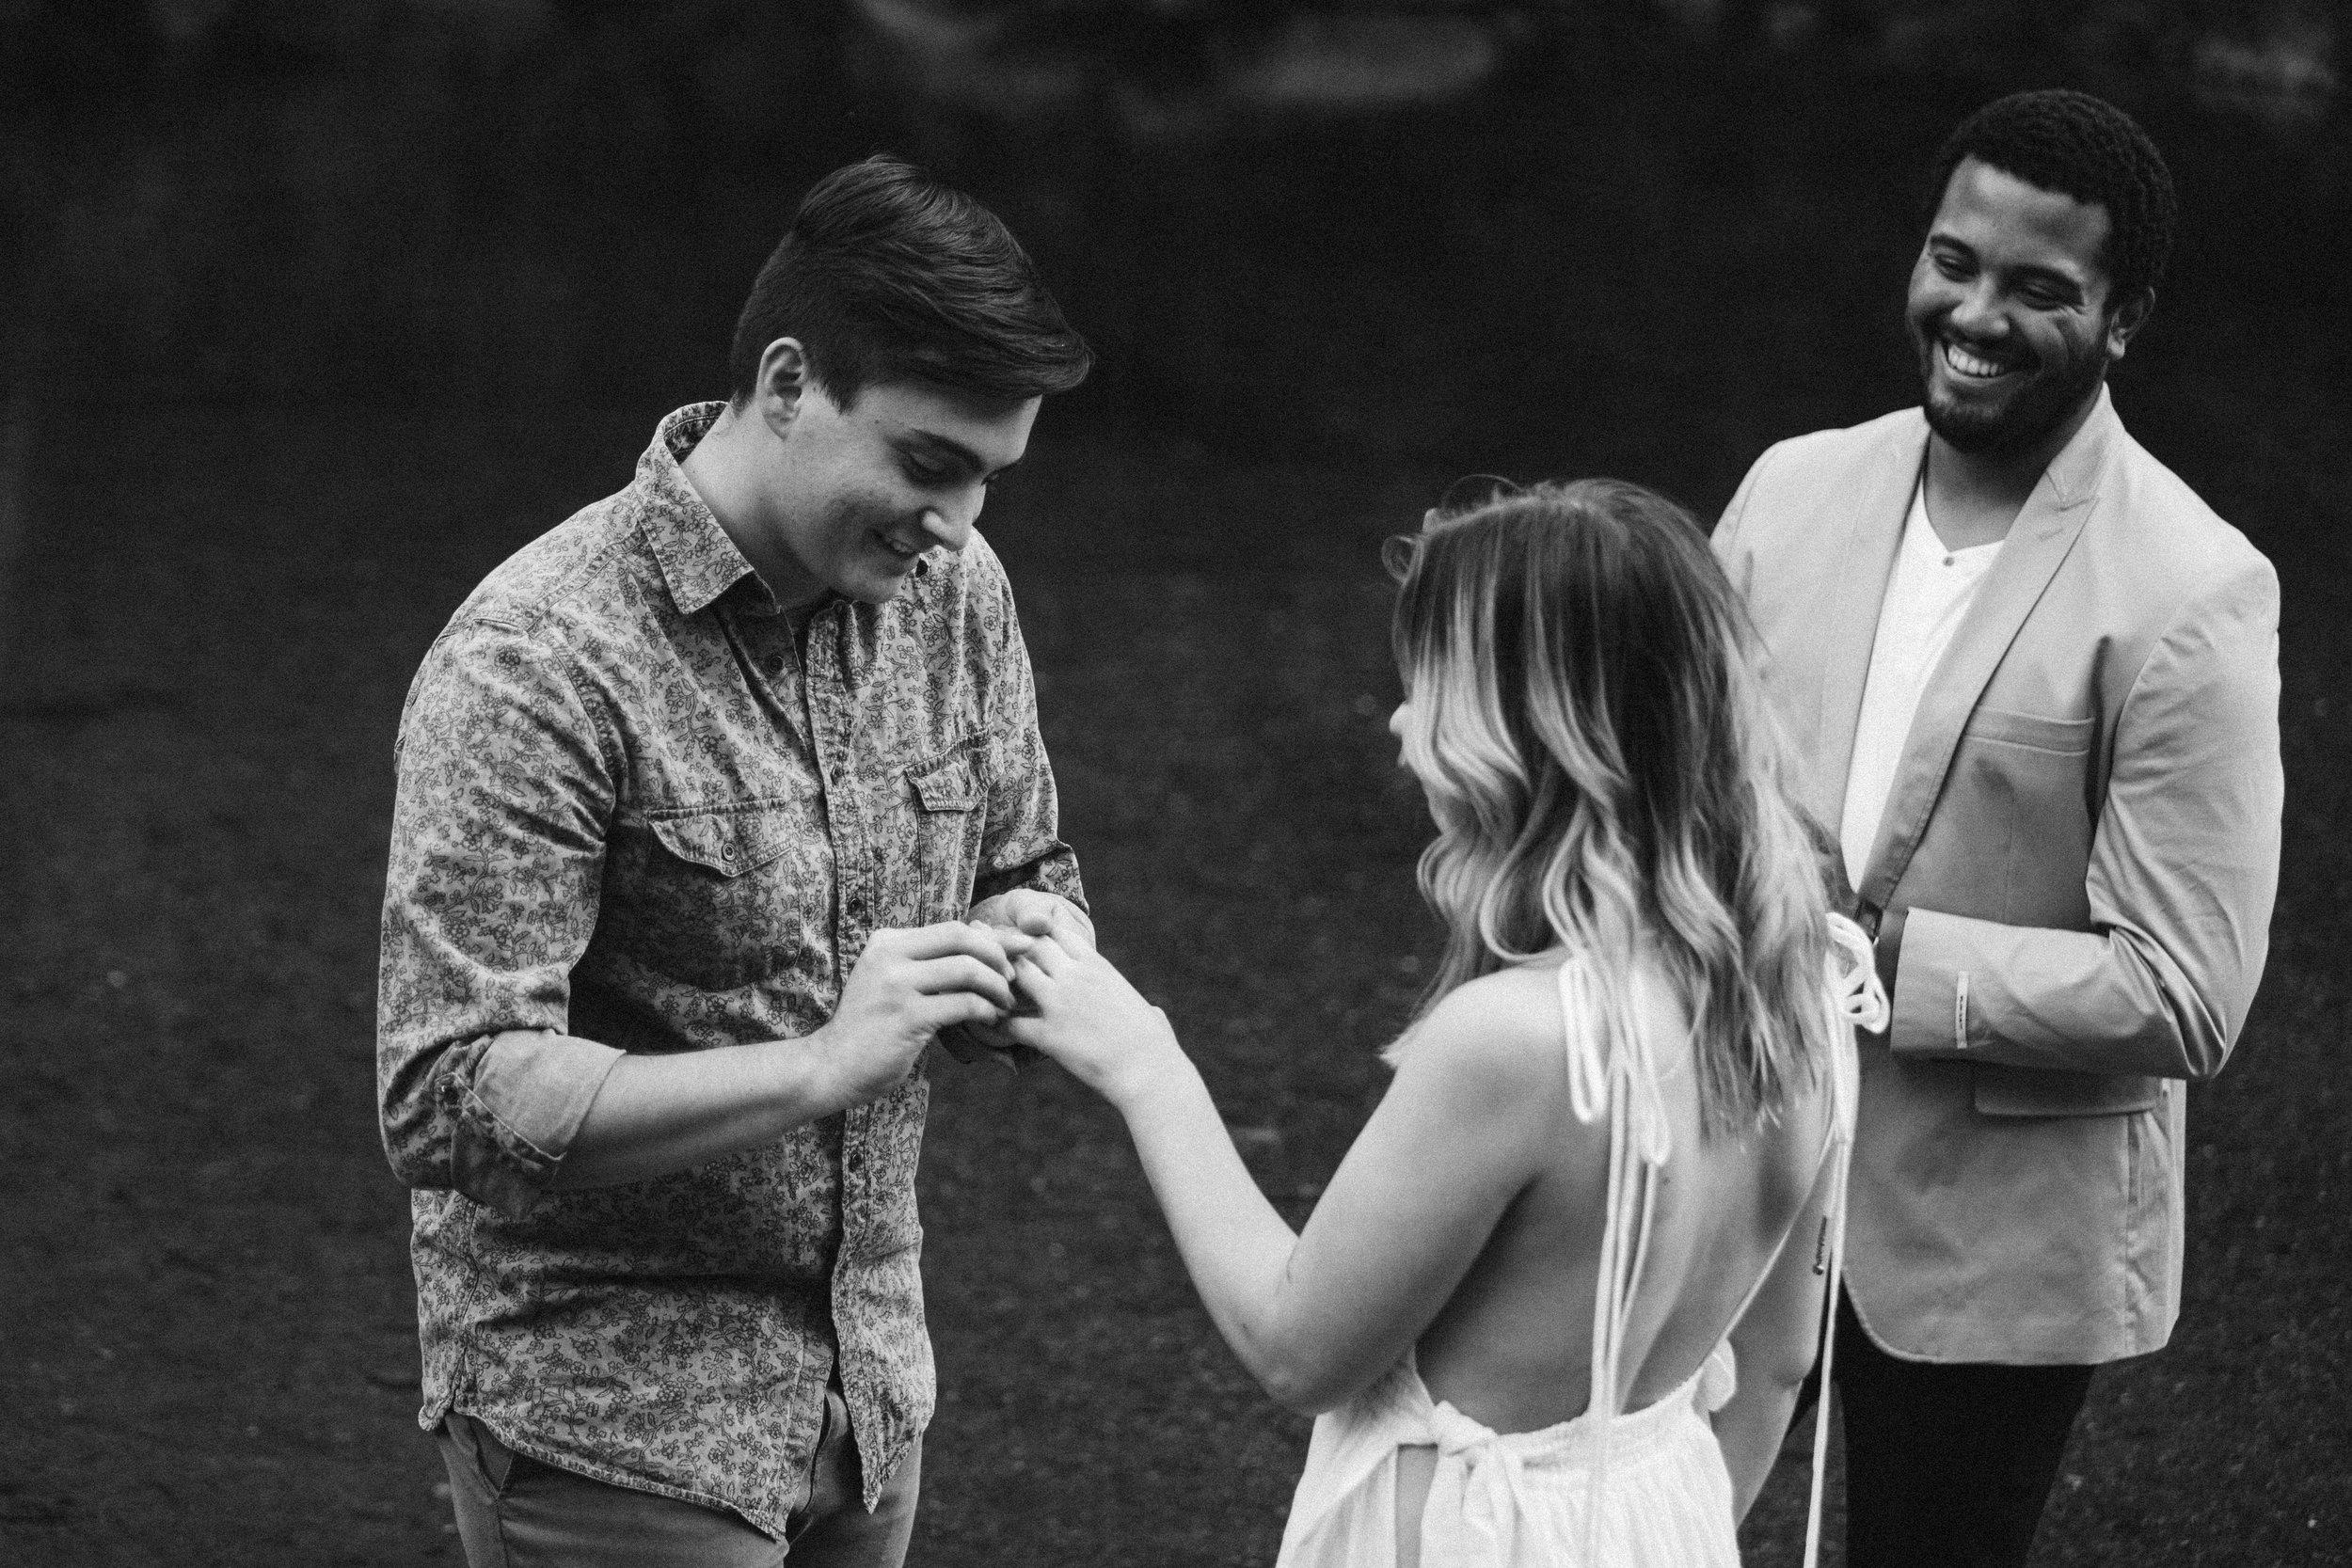 Hannah&Ben_Redwoods_Elopement_Engagement_PNW_SouthernOregon_NorthernCalifornia_ (19 of 23).jpg